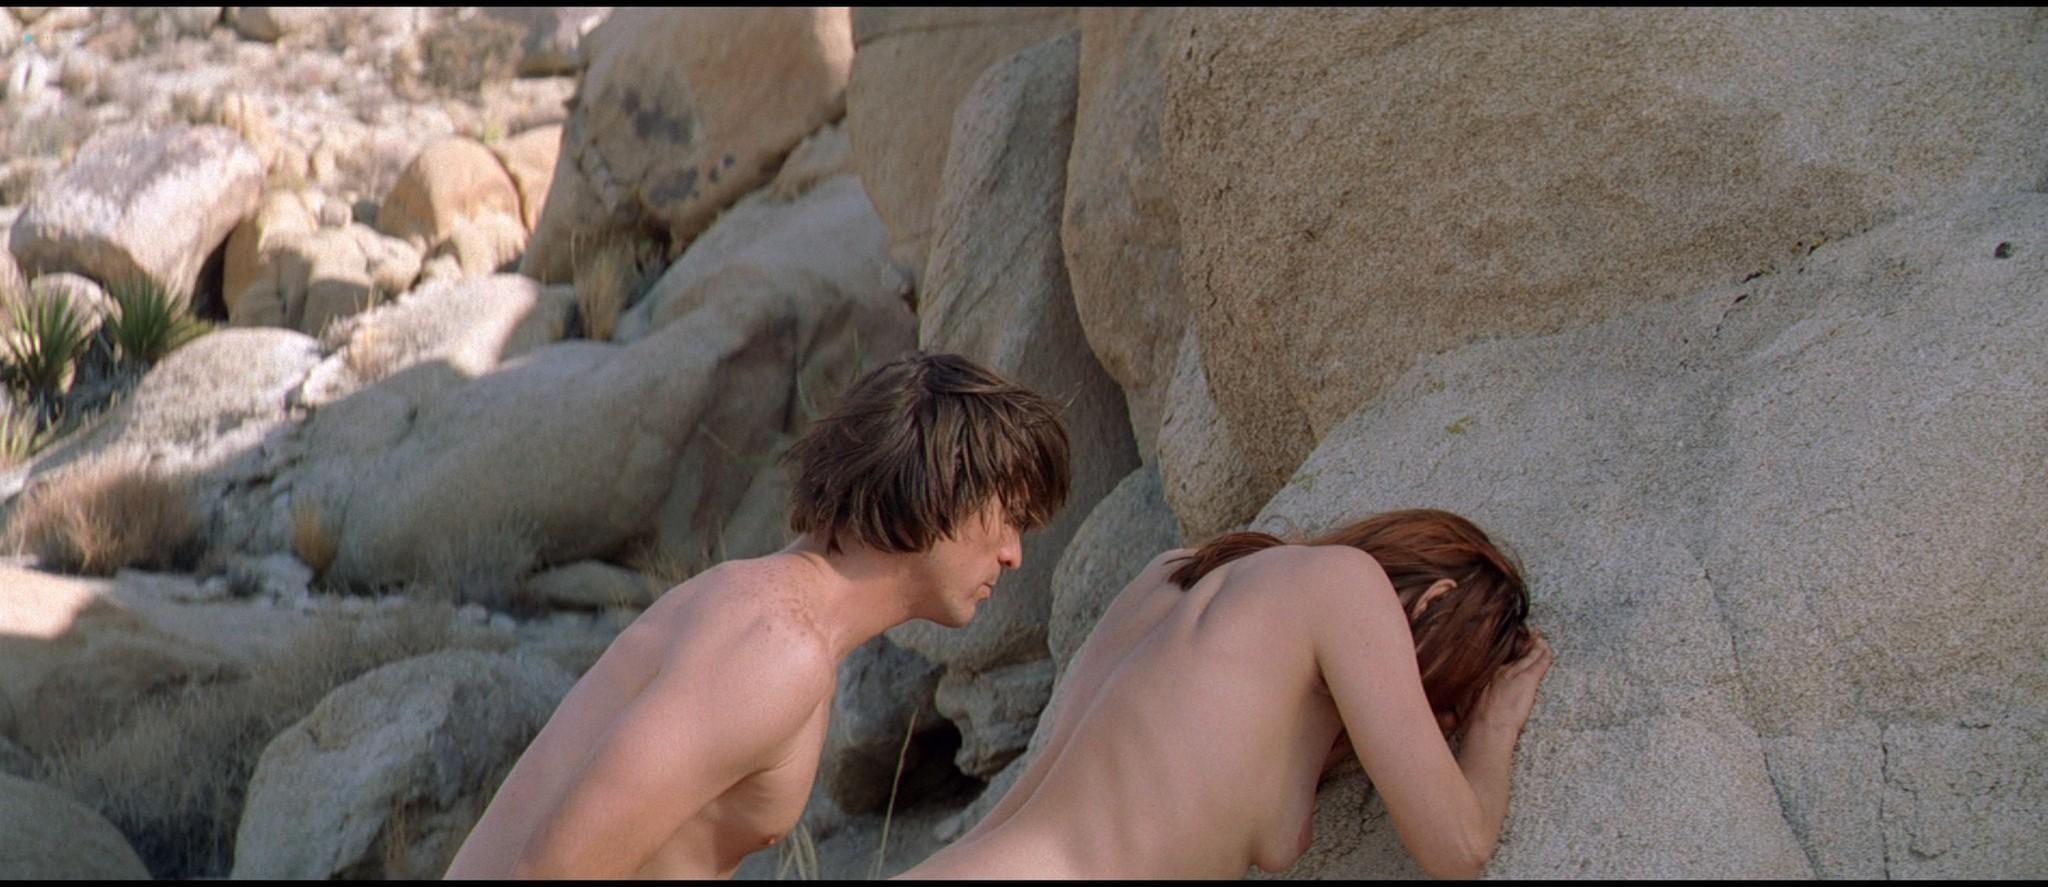 Yekaterina Golubeva nude full frontal explicit sex - Twentynine Palms (2003) HD 1080p BluRay REMUX (18)